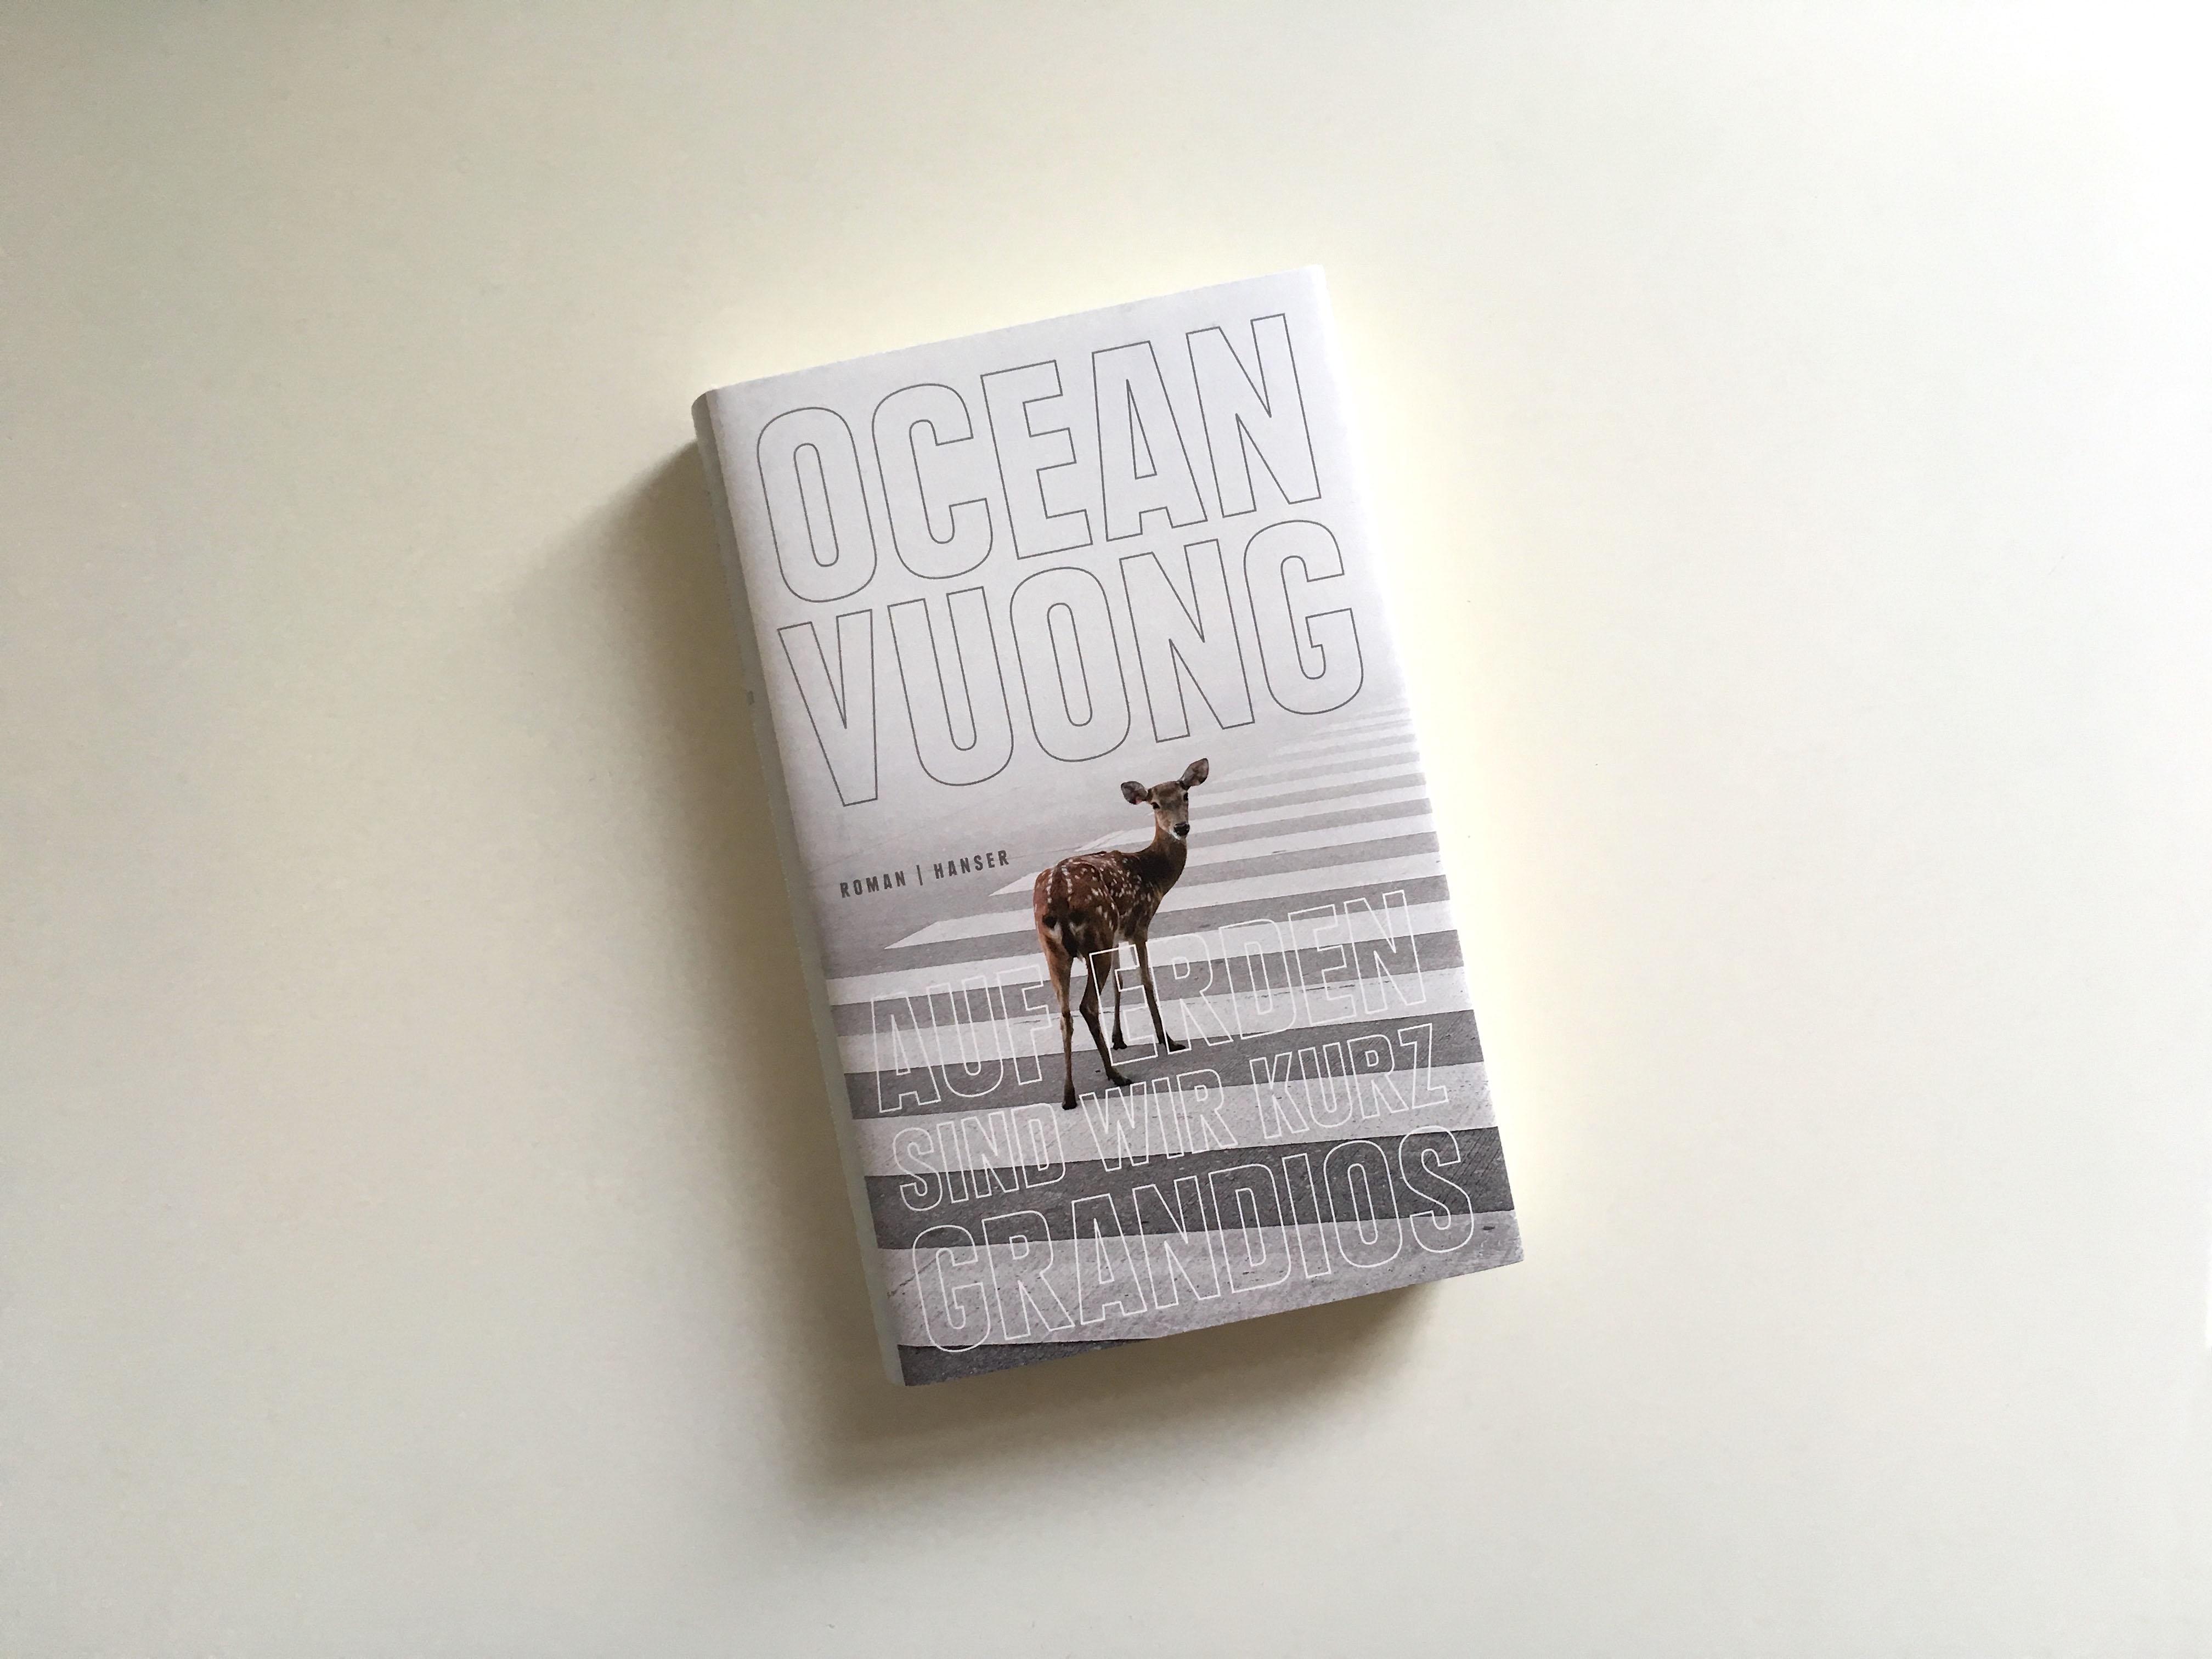 Ocean Vuong: Auf Erden sind wir kurz grandios